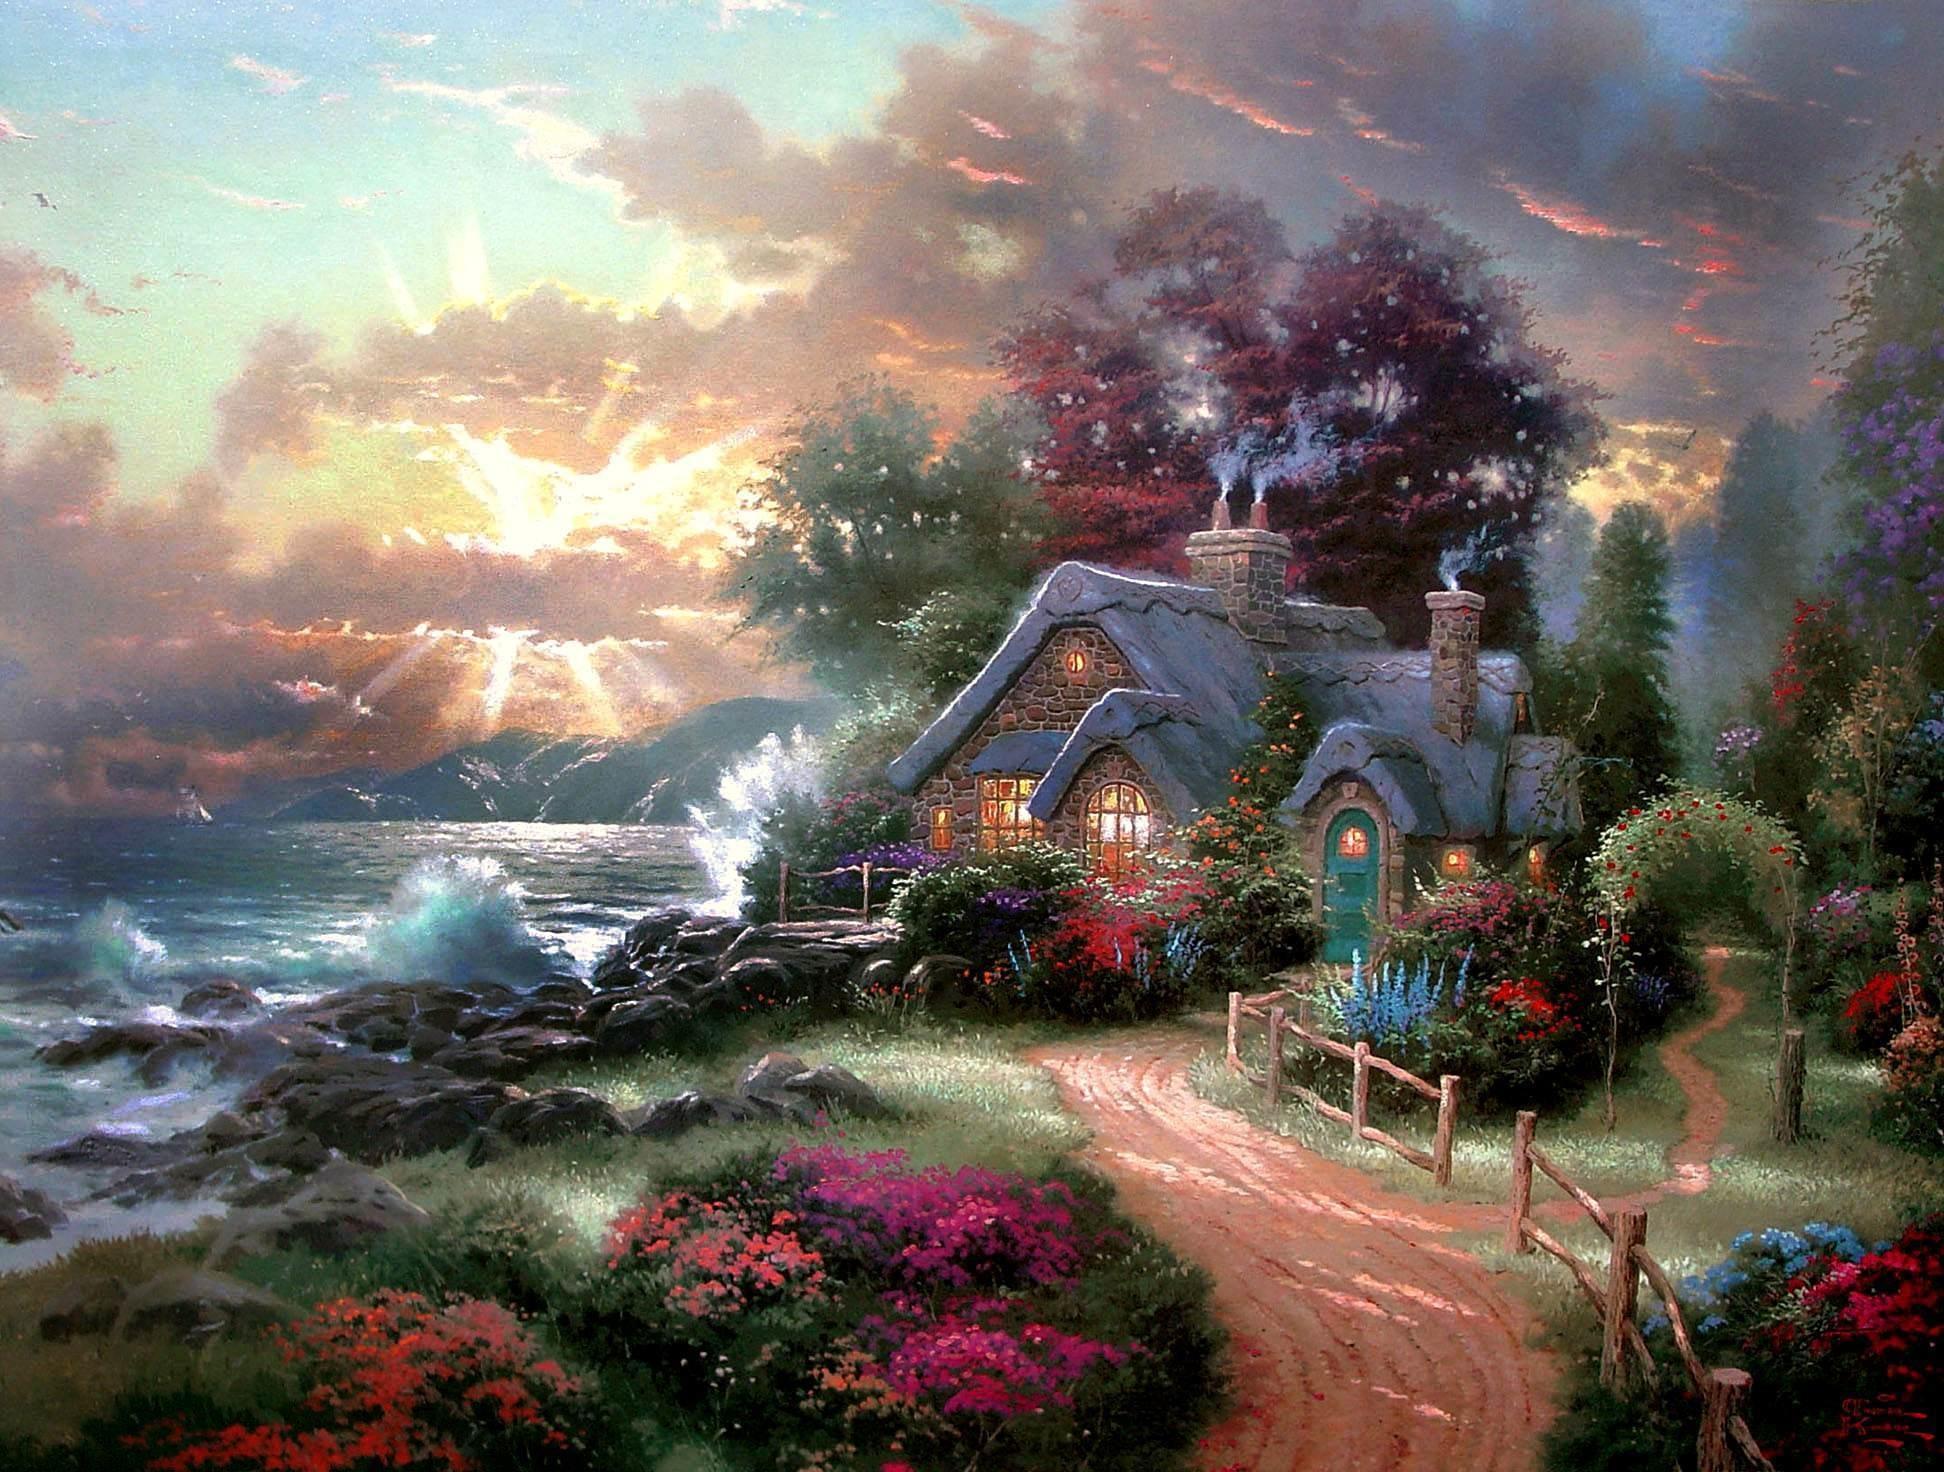 HD Wallpaper Background ID Thomas Kinkade Disney Wallpaper